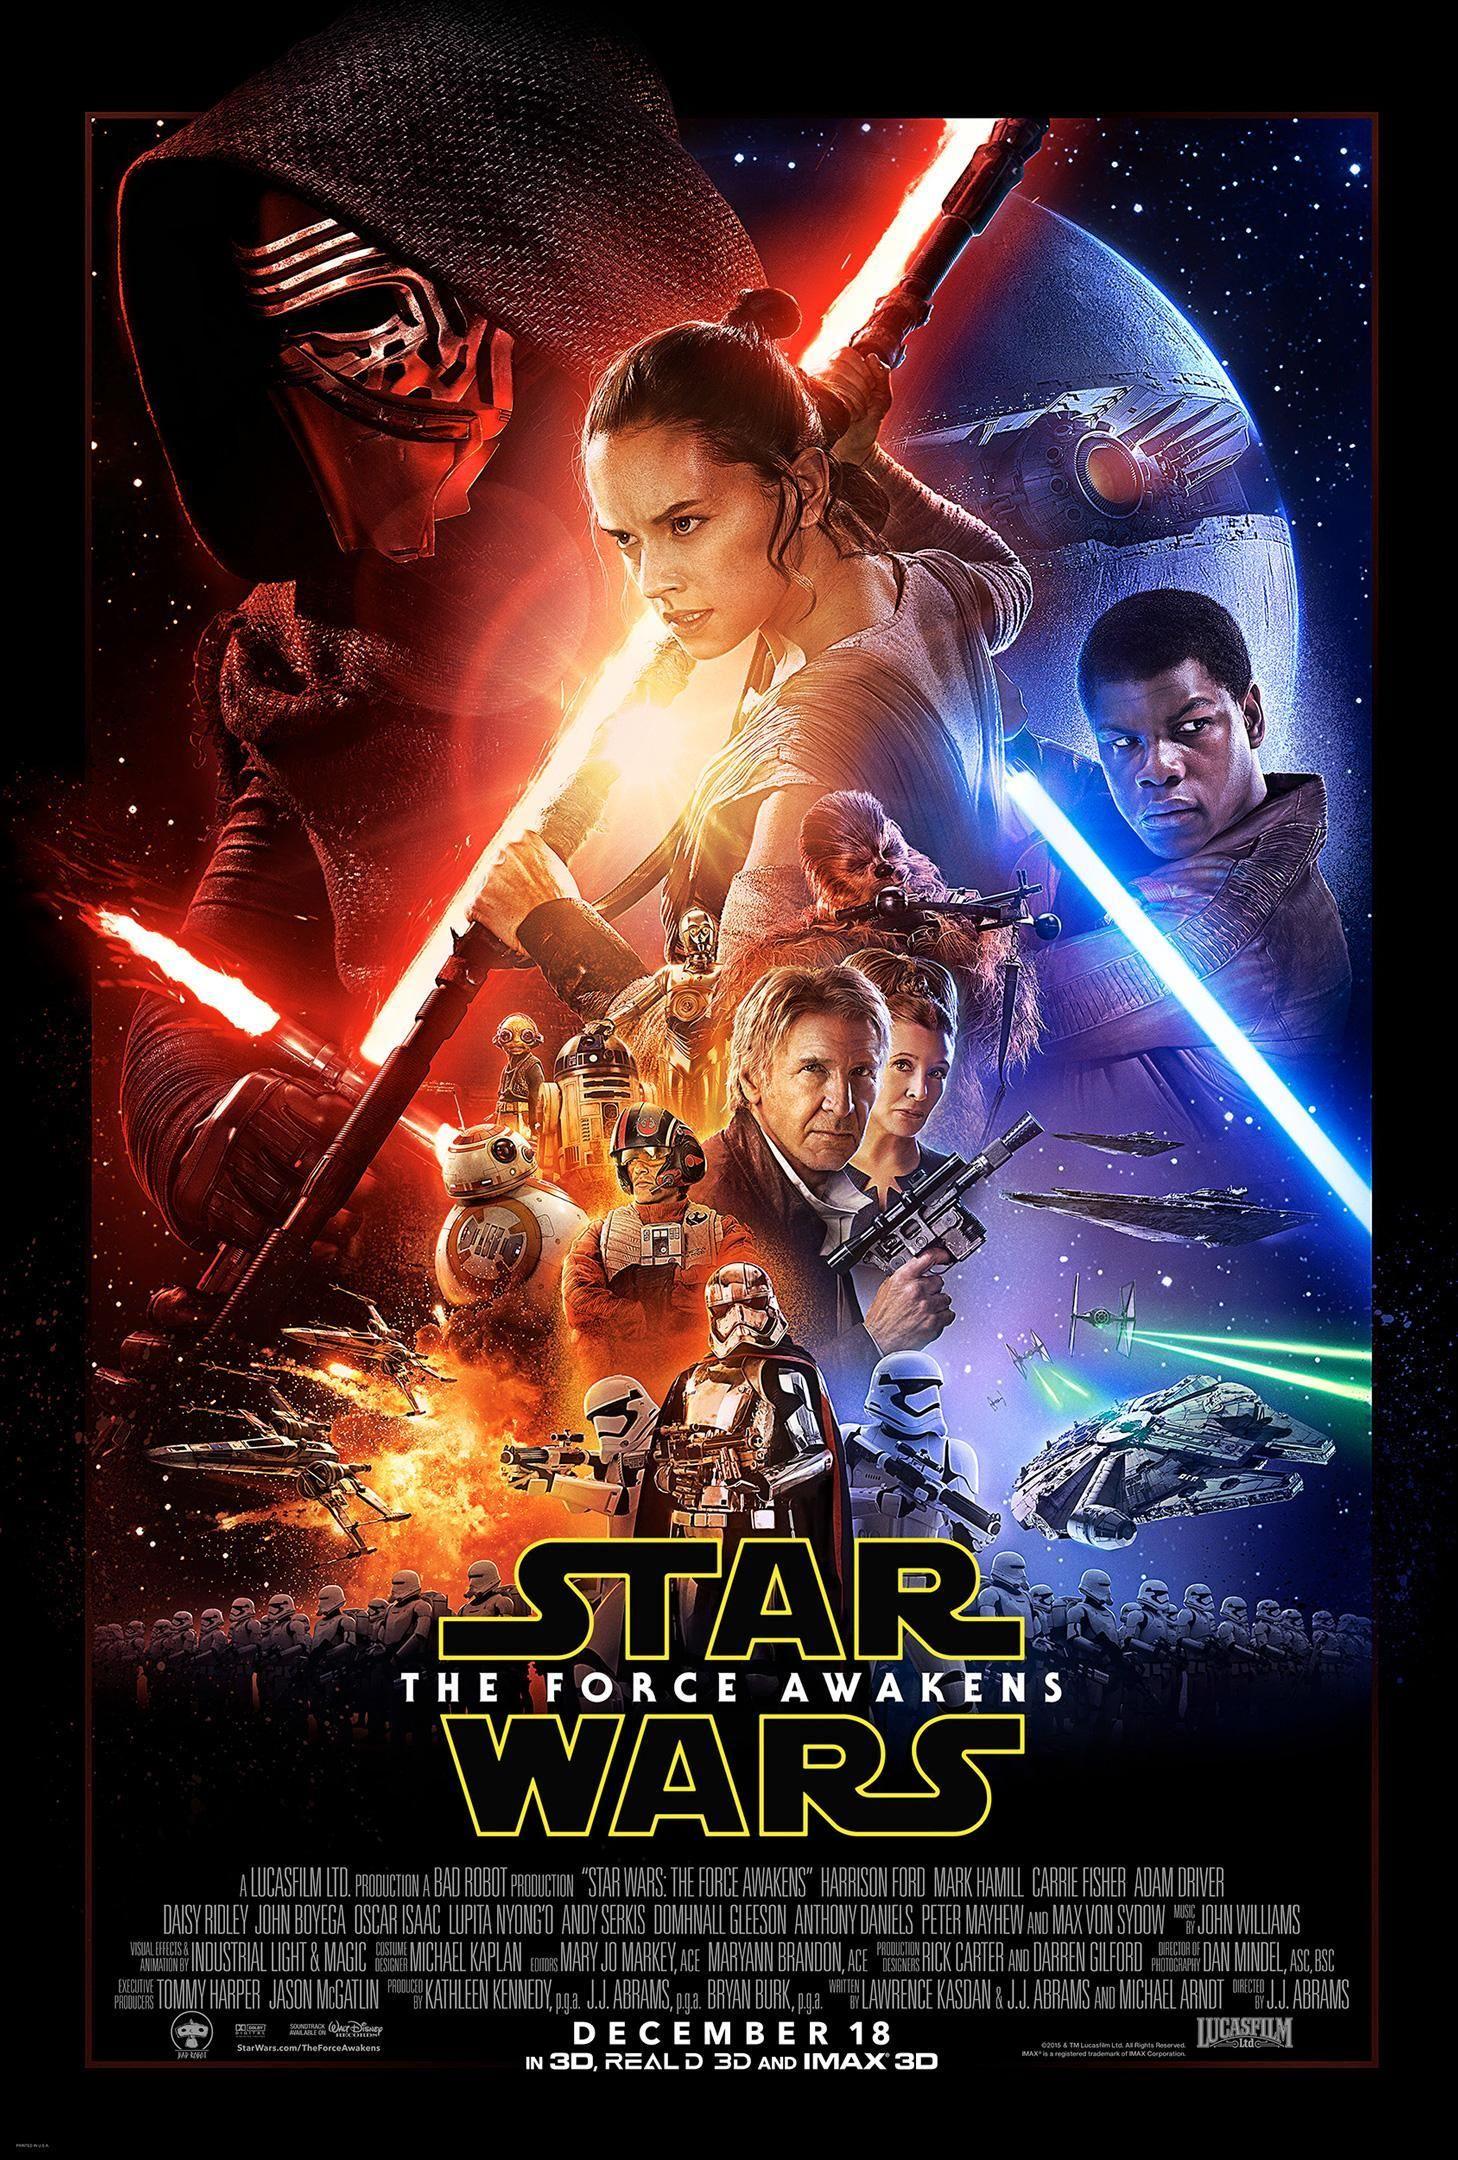 Star Wars: The Force Awakens.